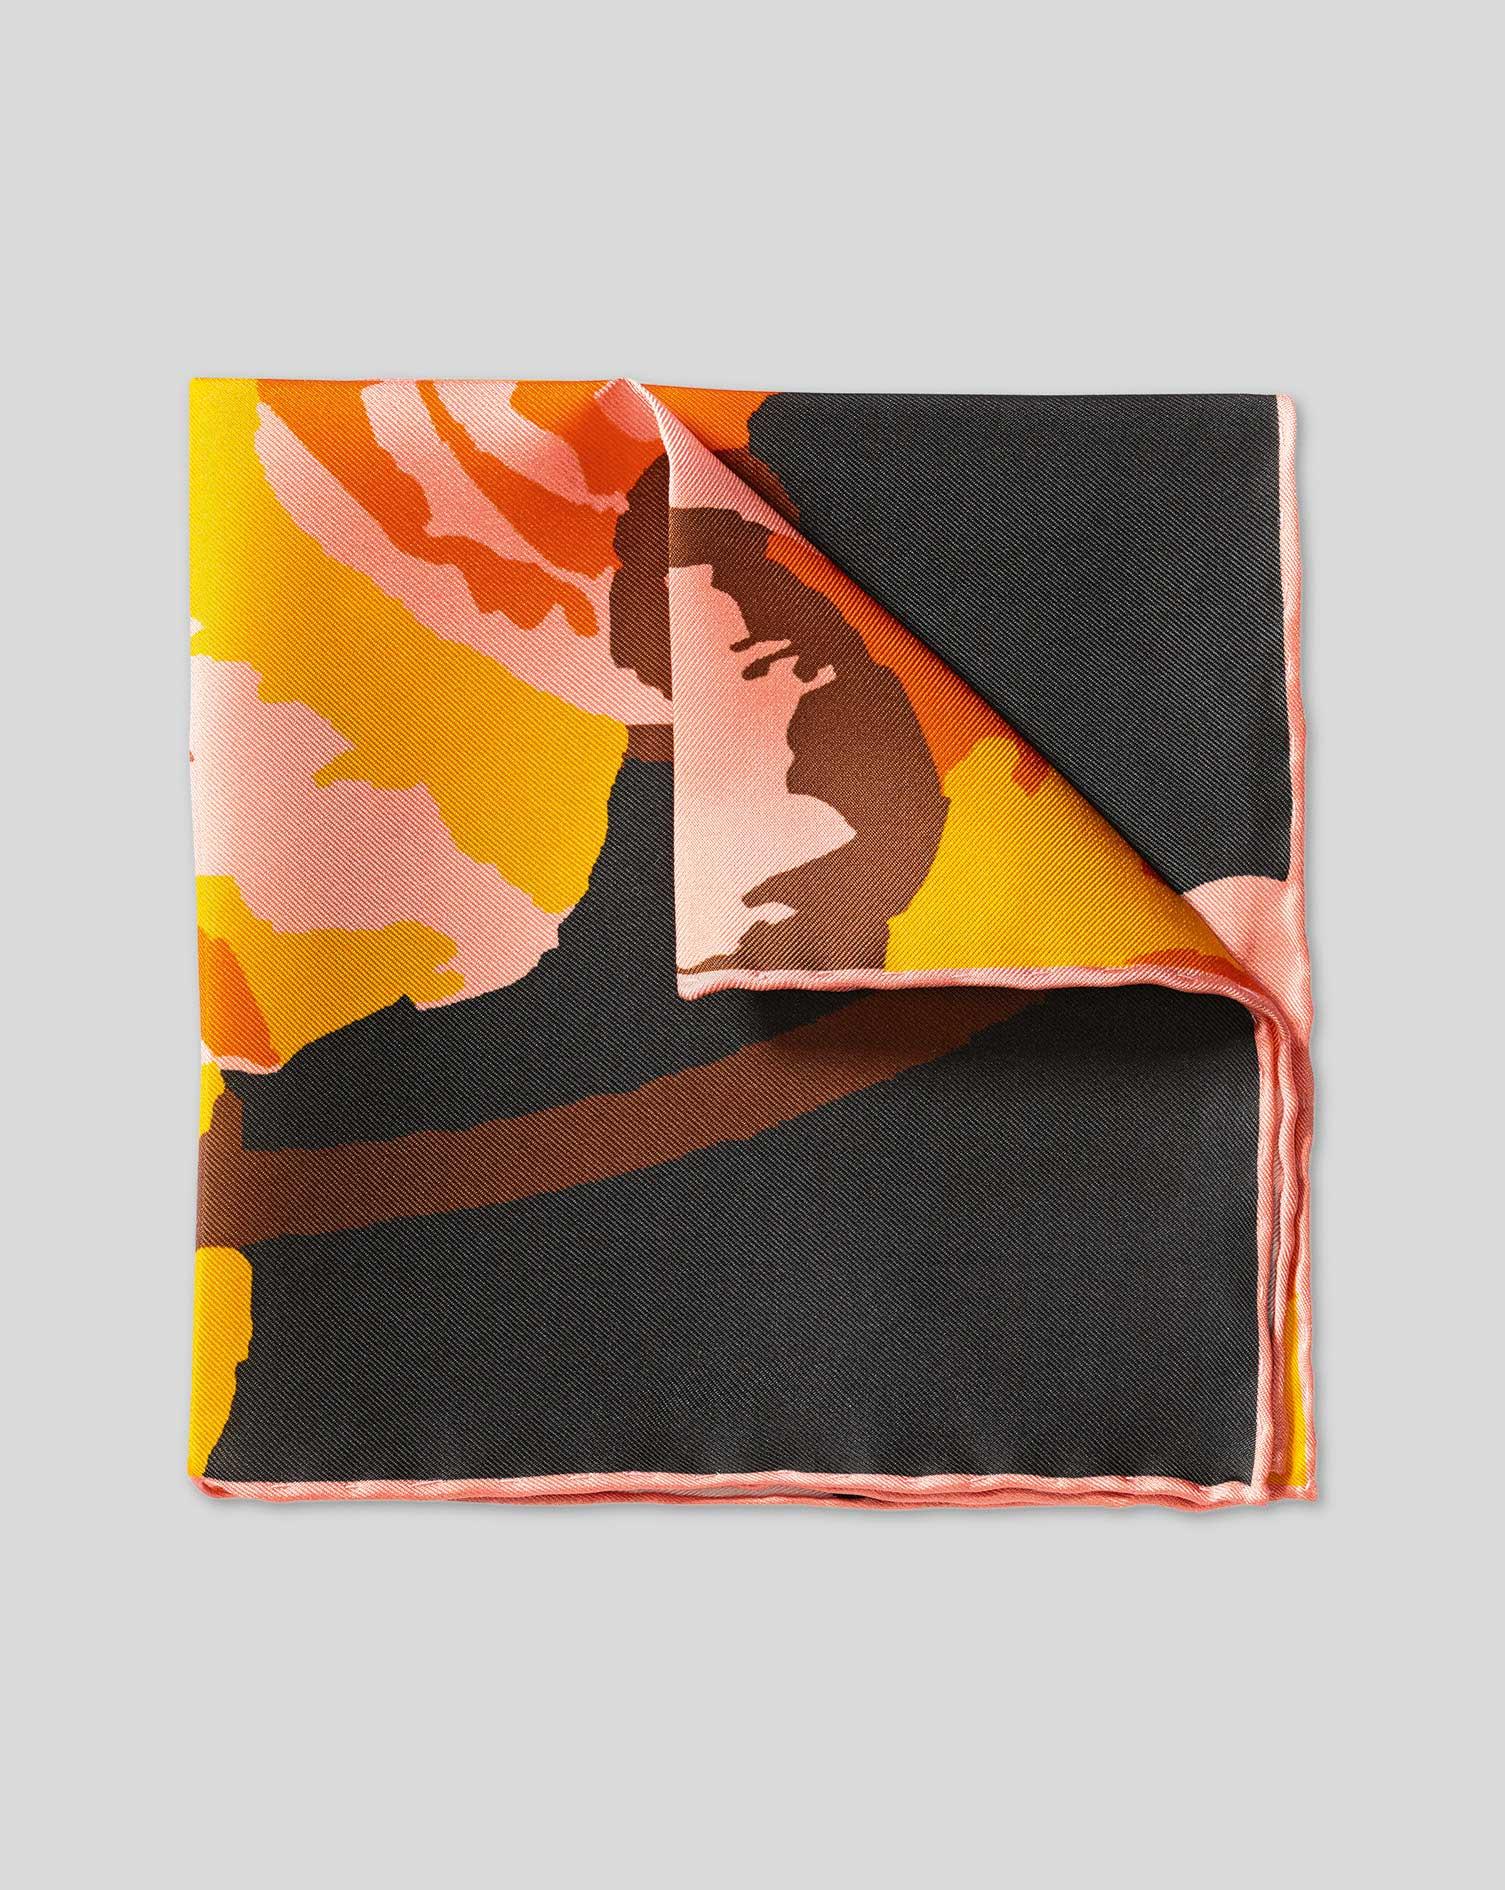 Image of Charles Tyrwhitt Abstract Floral Print Silk Pocket Square - Navy & Orange by Charles Tyrwhitt